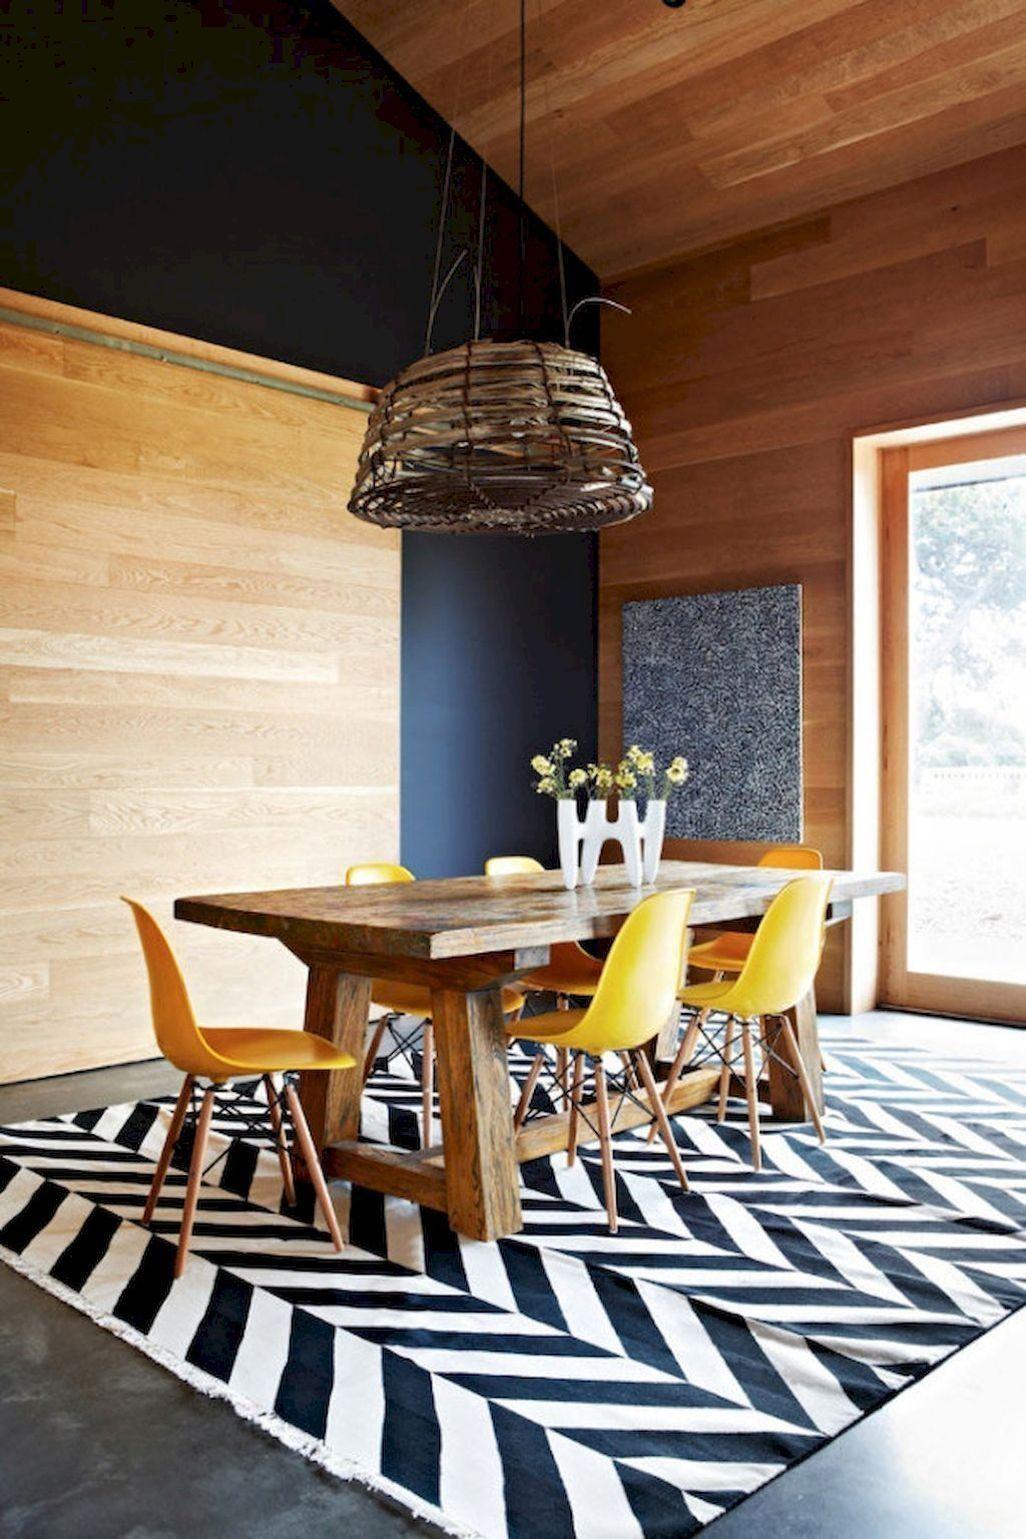 46 modern diy wooden dining tables ideas wooden dining